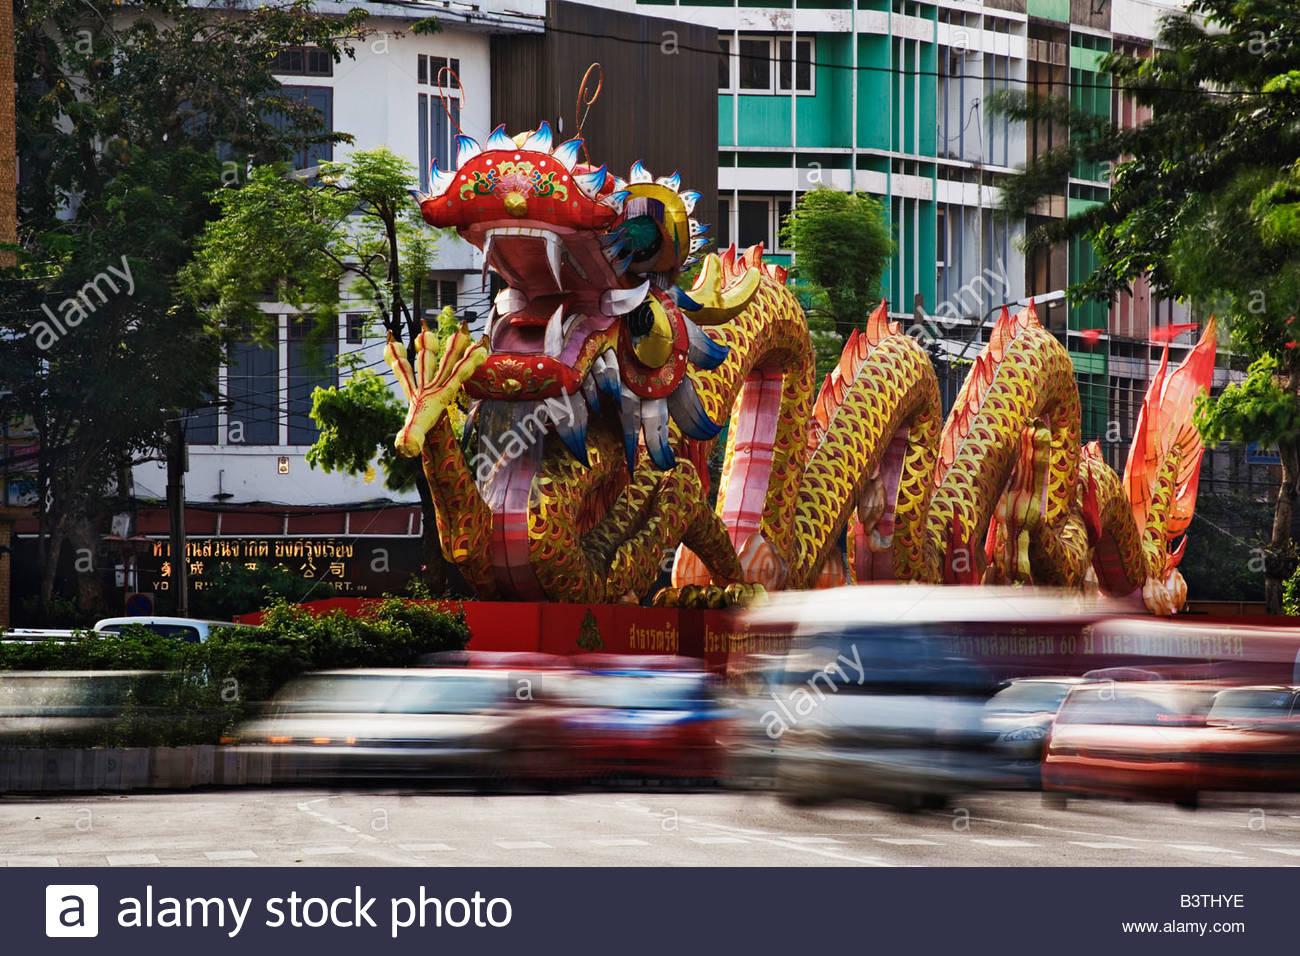 Large decorative dragon, Odeon Circle, Chinatown, Bangkok, Thailand - Stock Image